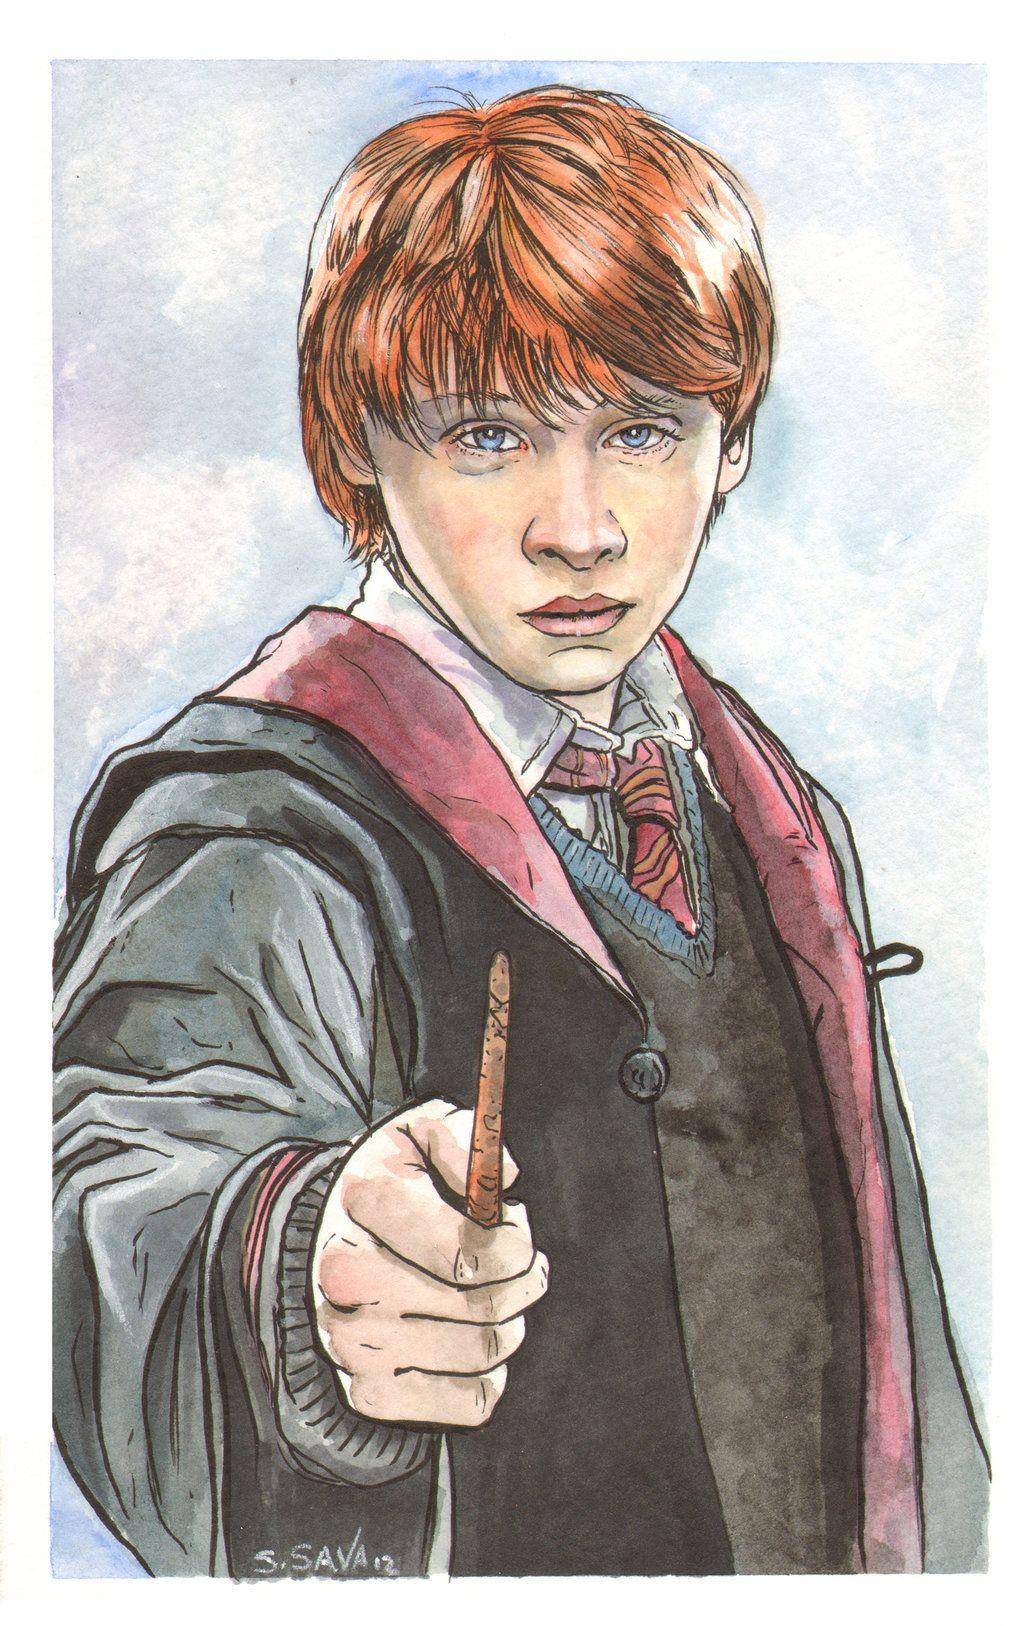 Incroyable  Mot-Clé Not Found   Harry potter ron weasley, Harry potter artwork, Harry ...